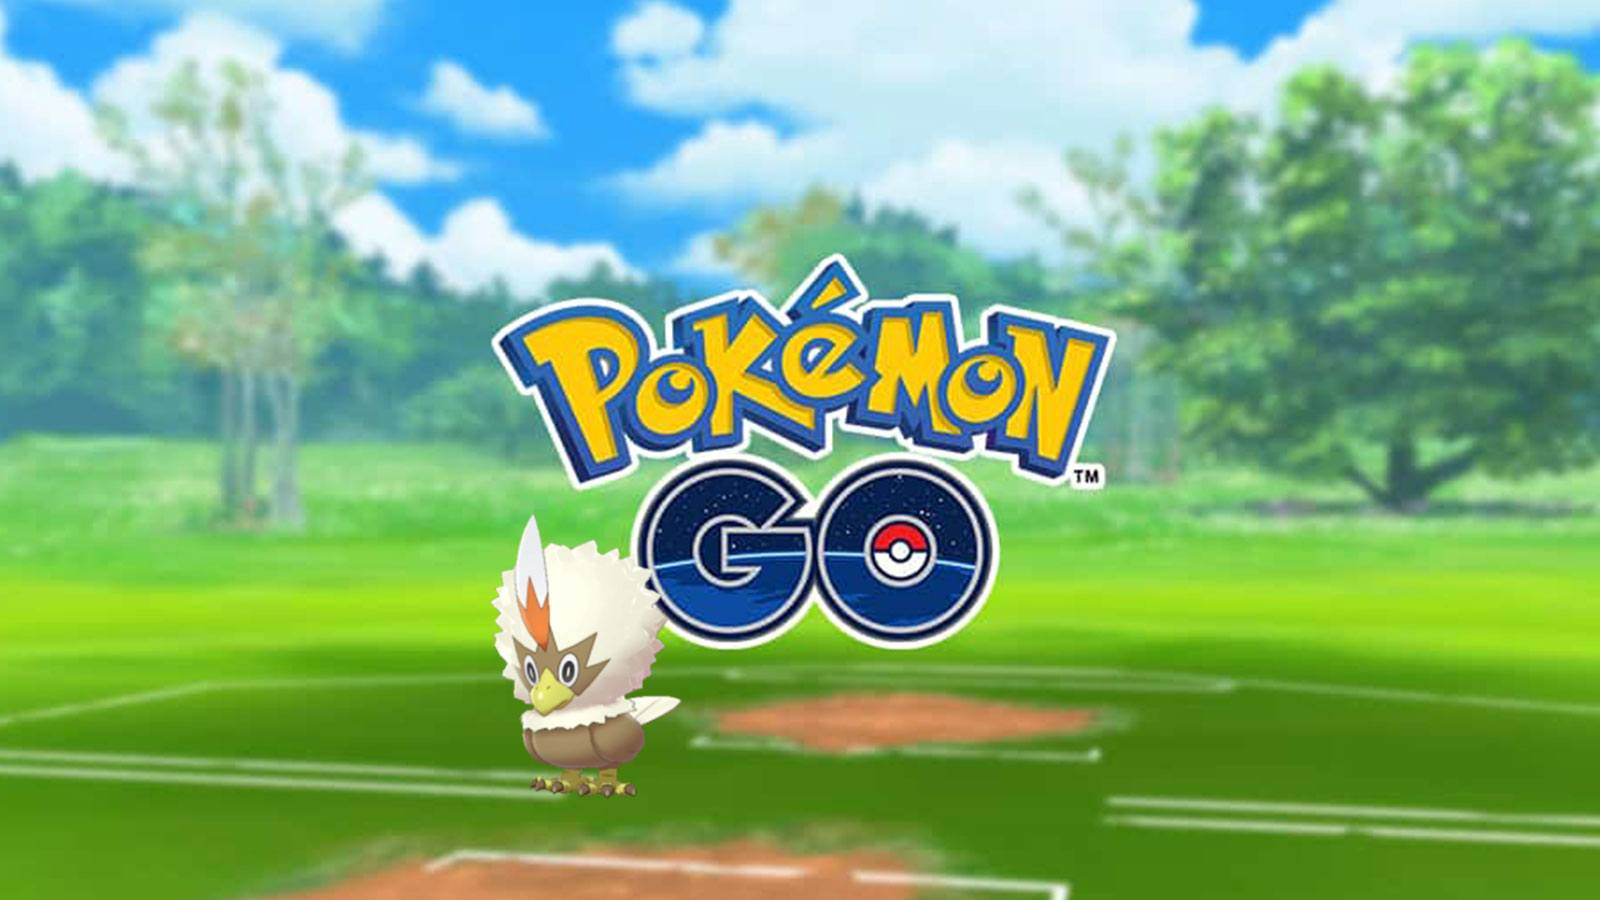 Pokémon Go furaiglon shiny Niantic